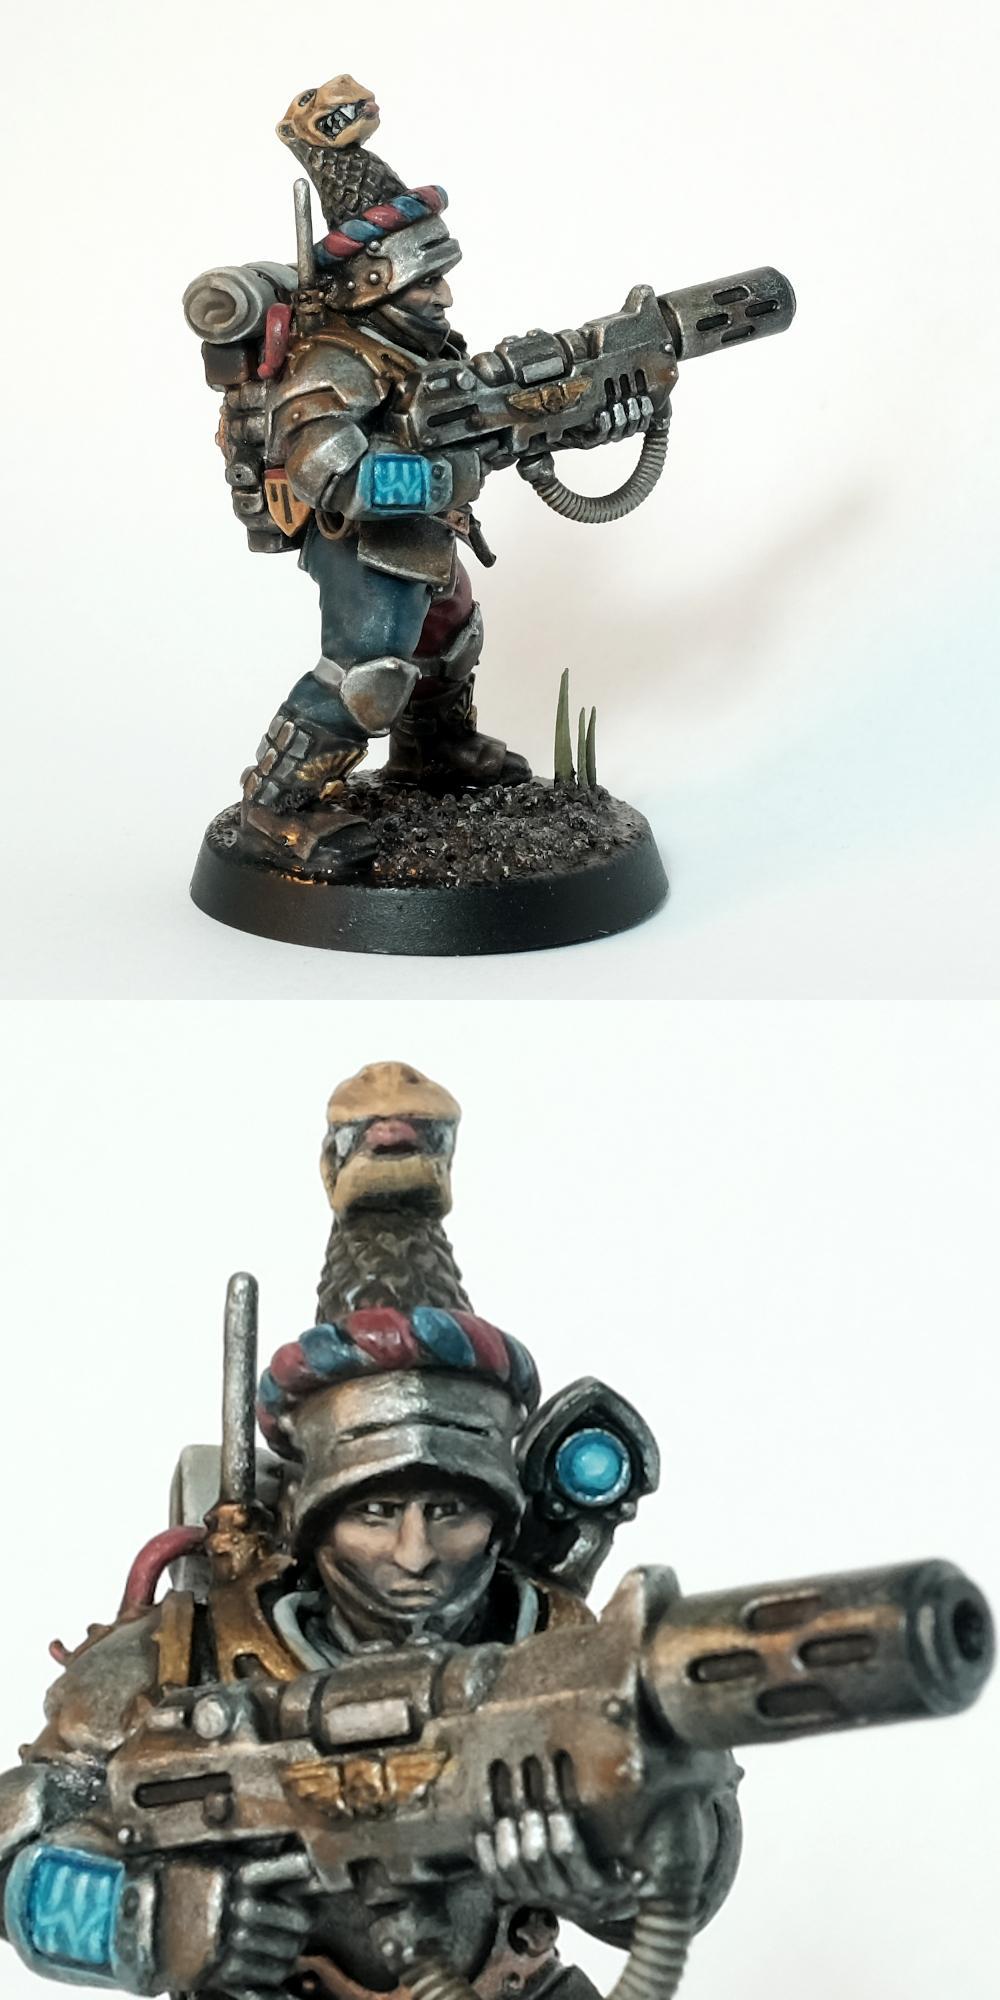 Astra Militarum, Feudal, Imperial Guard, Infantry, Warhammer 40,000